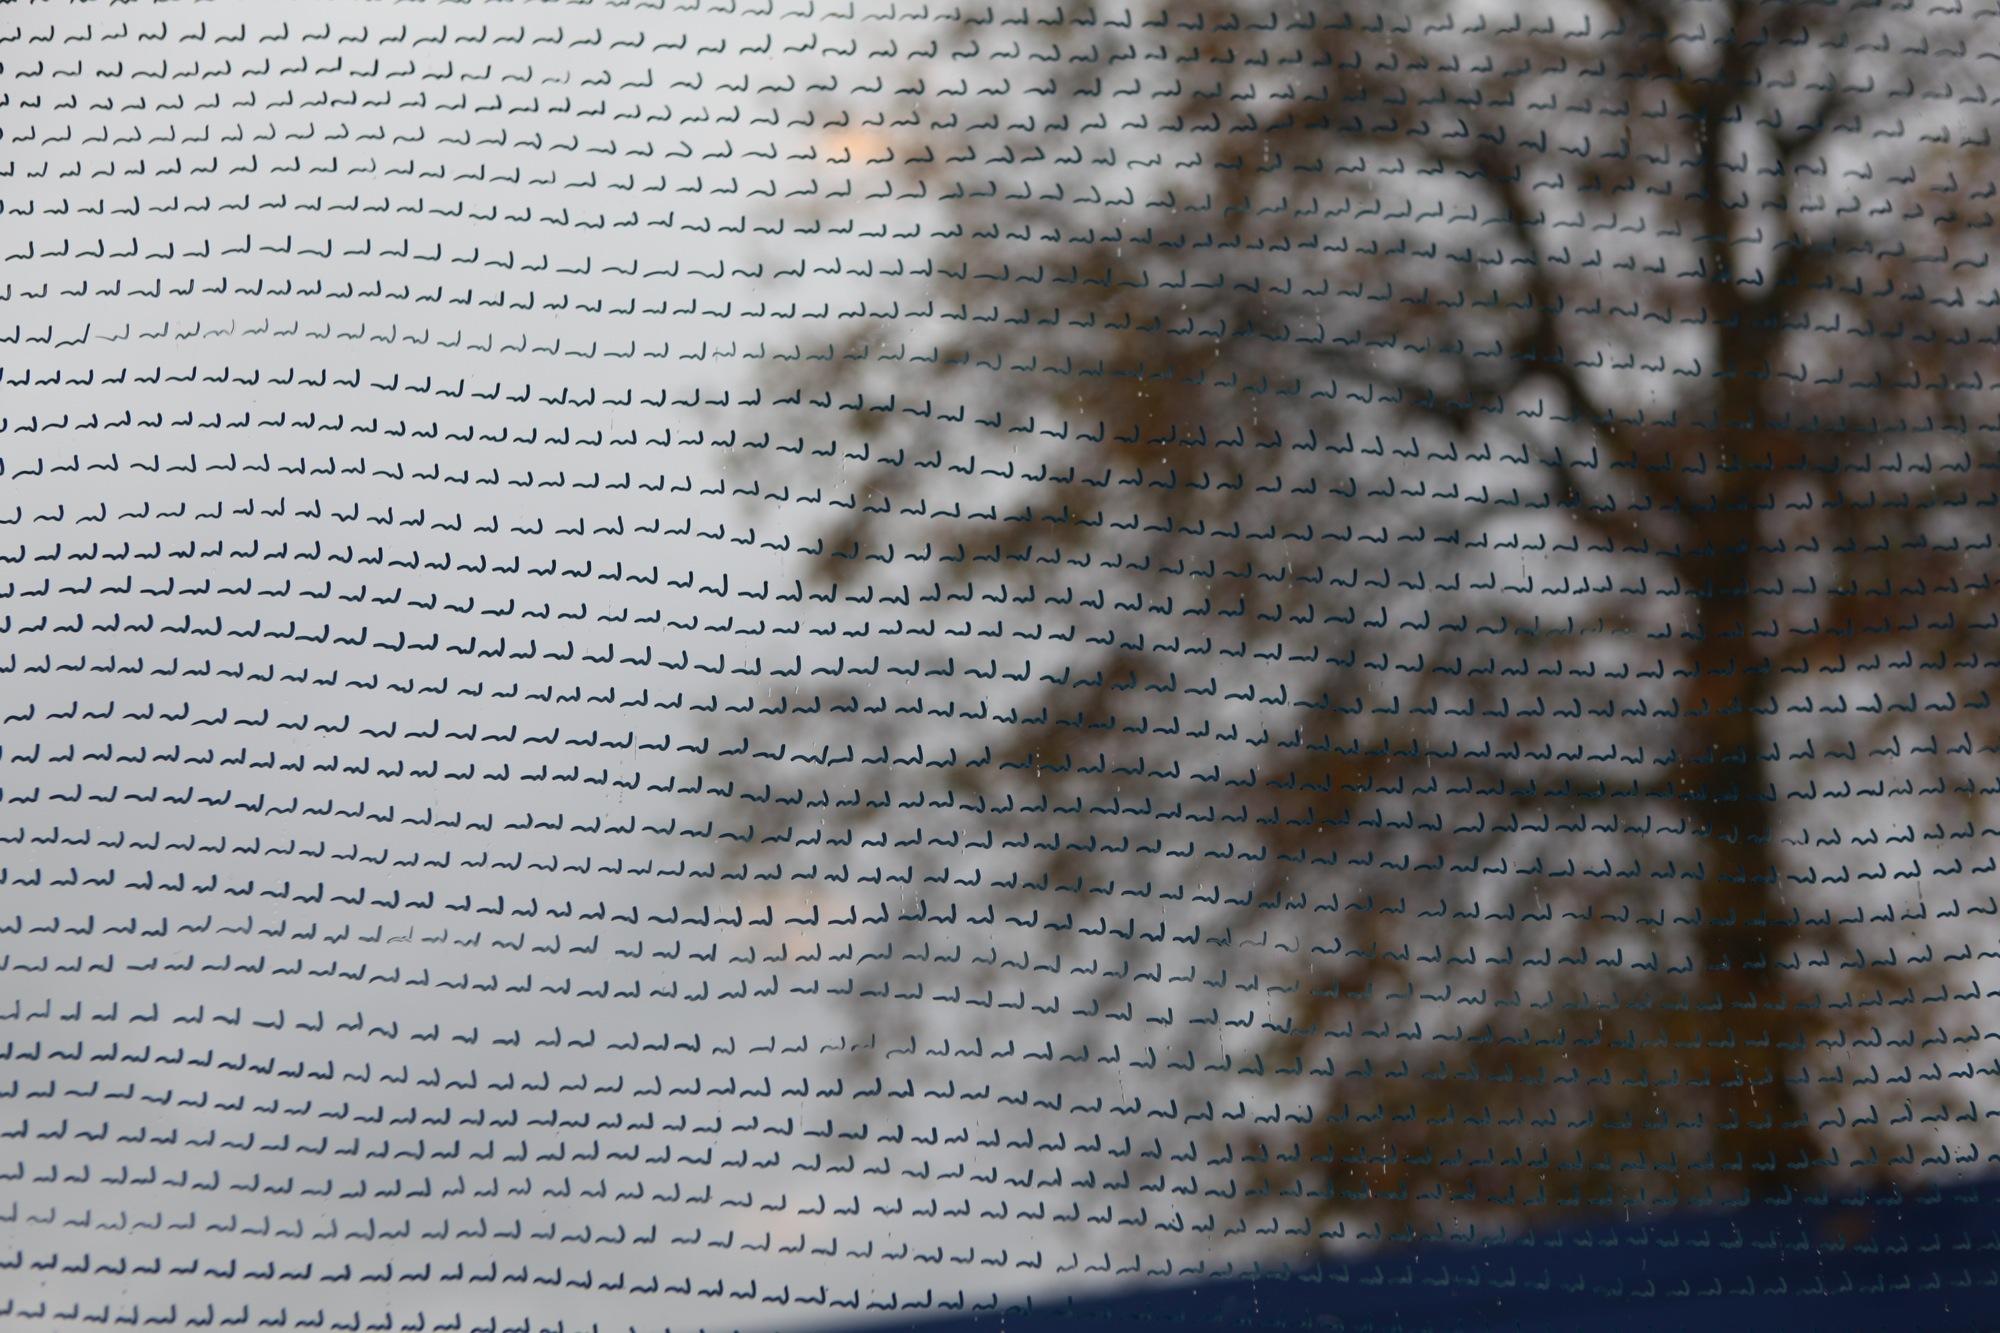 sans titre, 2012, acrylic on glass, residence at HEC Paris